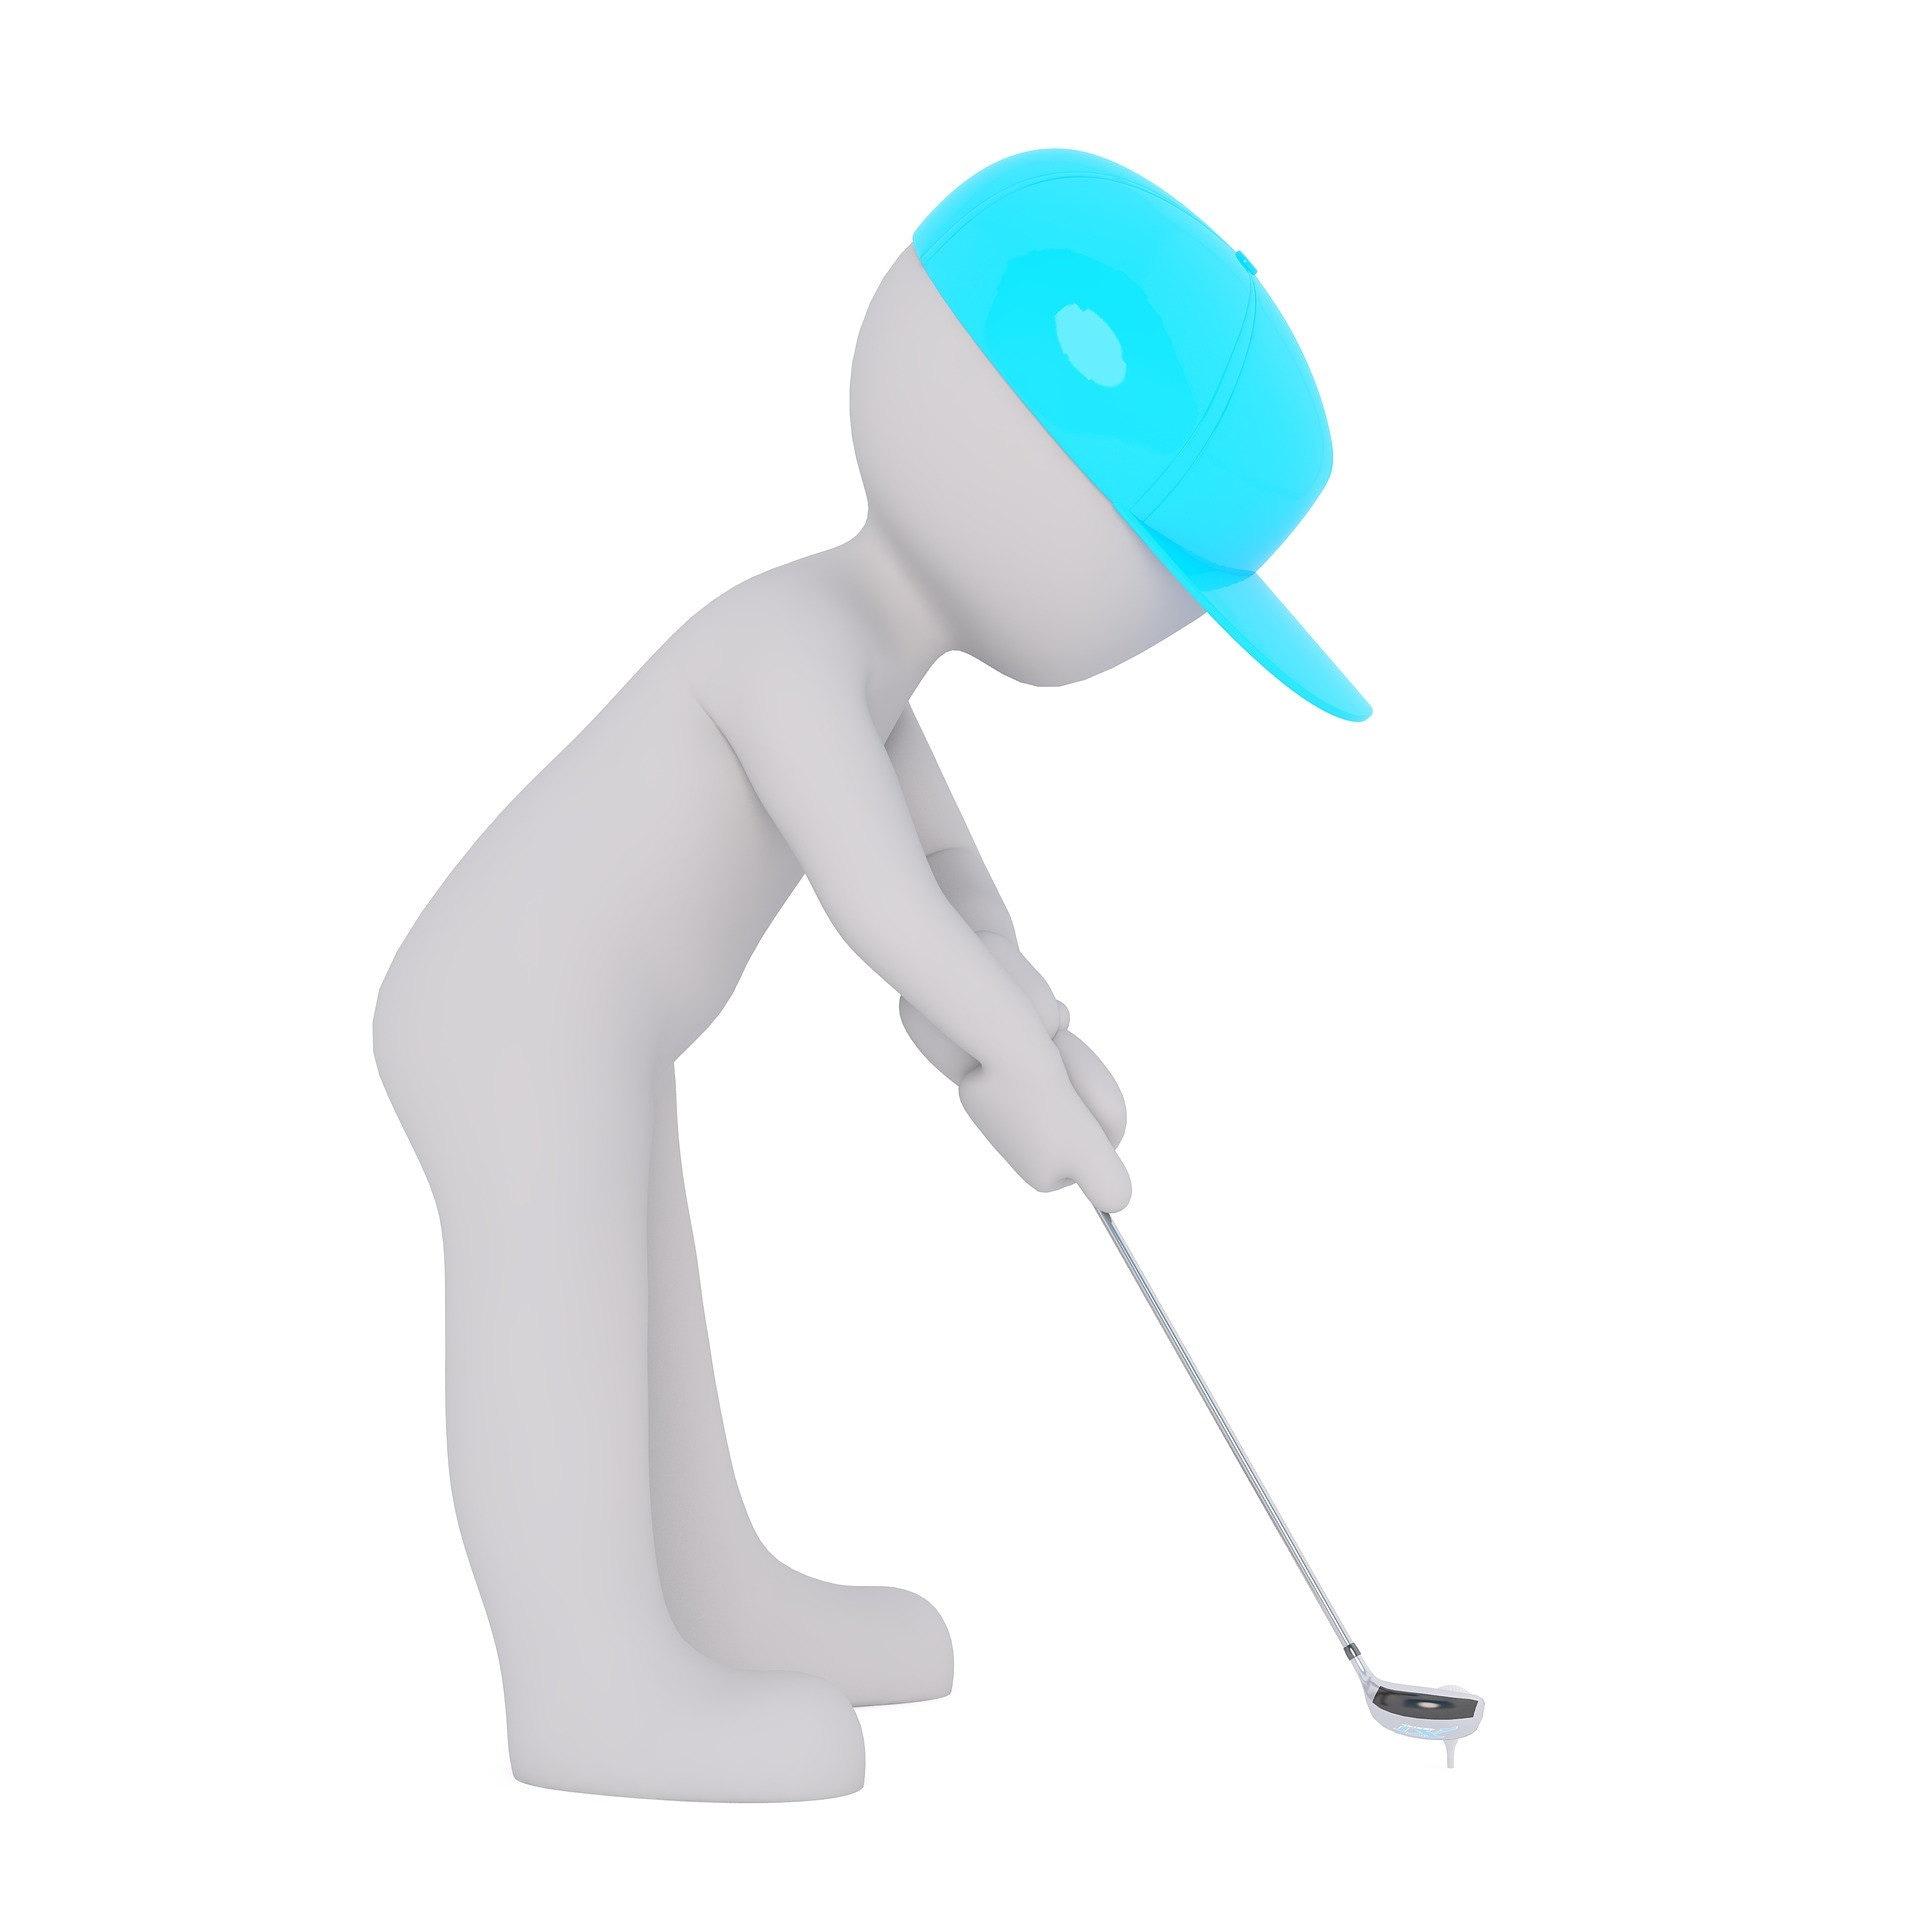 Golfing, driving range, national golf month